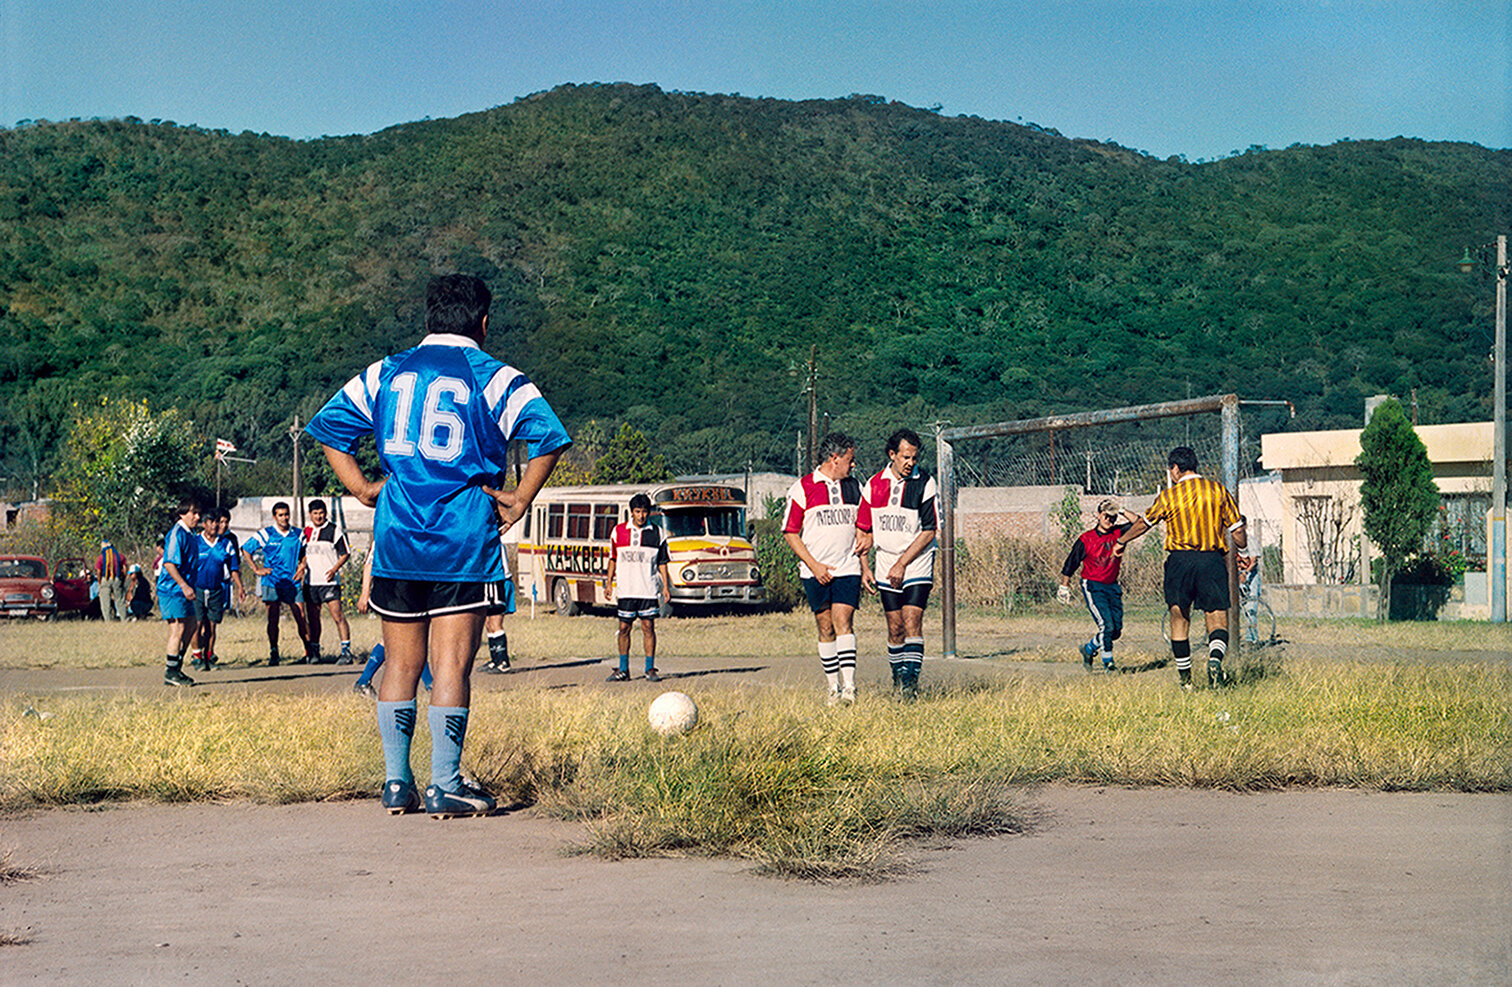 17 Fútbol Football 2000 copia.jpg